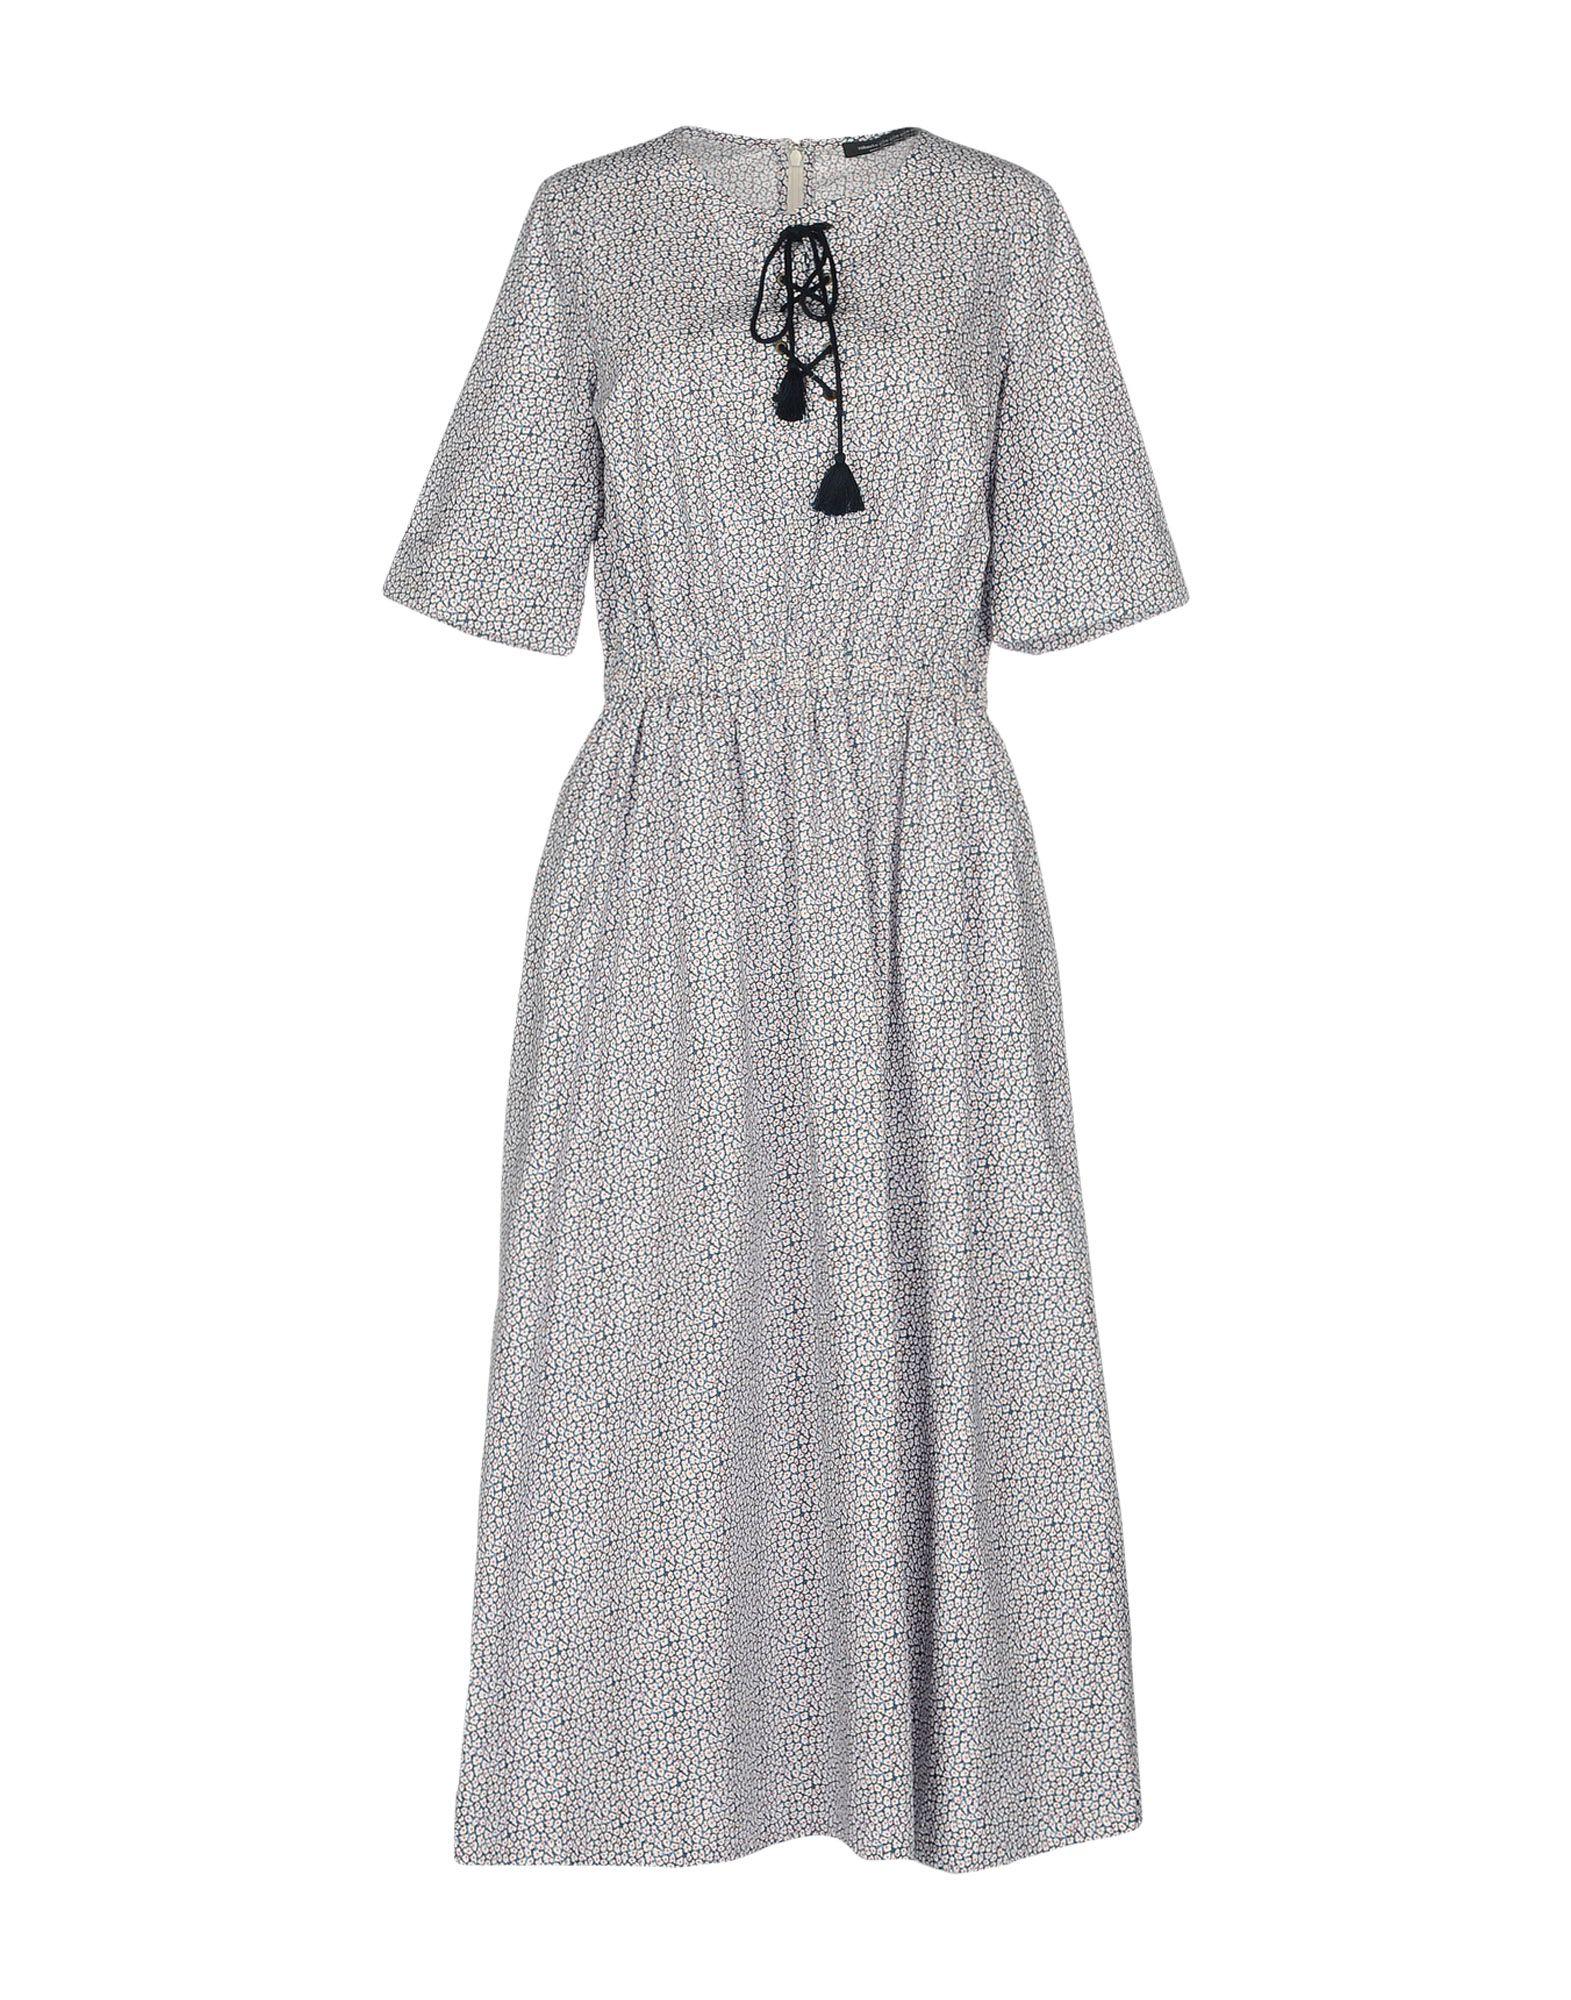 ROBERTO COLLINA Платье длиной 3/4 lisa corti платье длиной 3 4